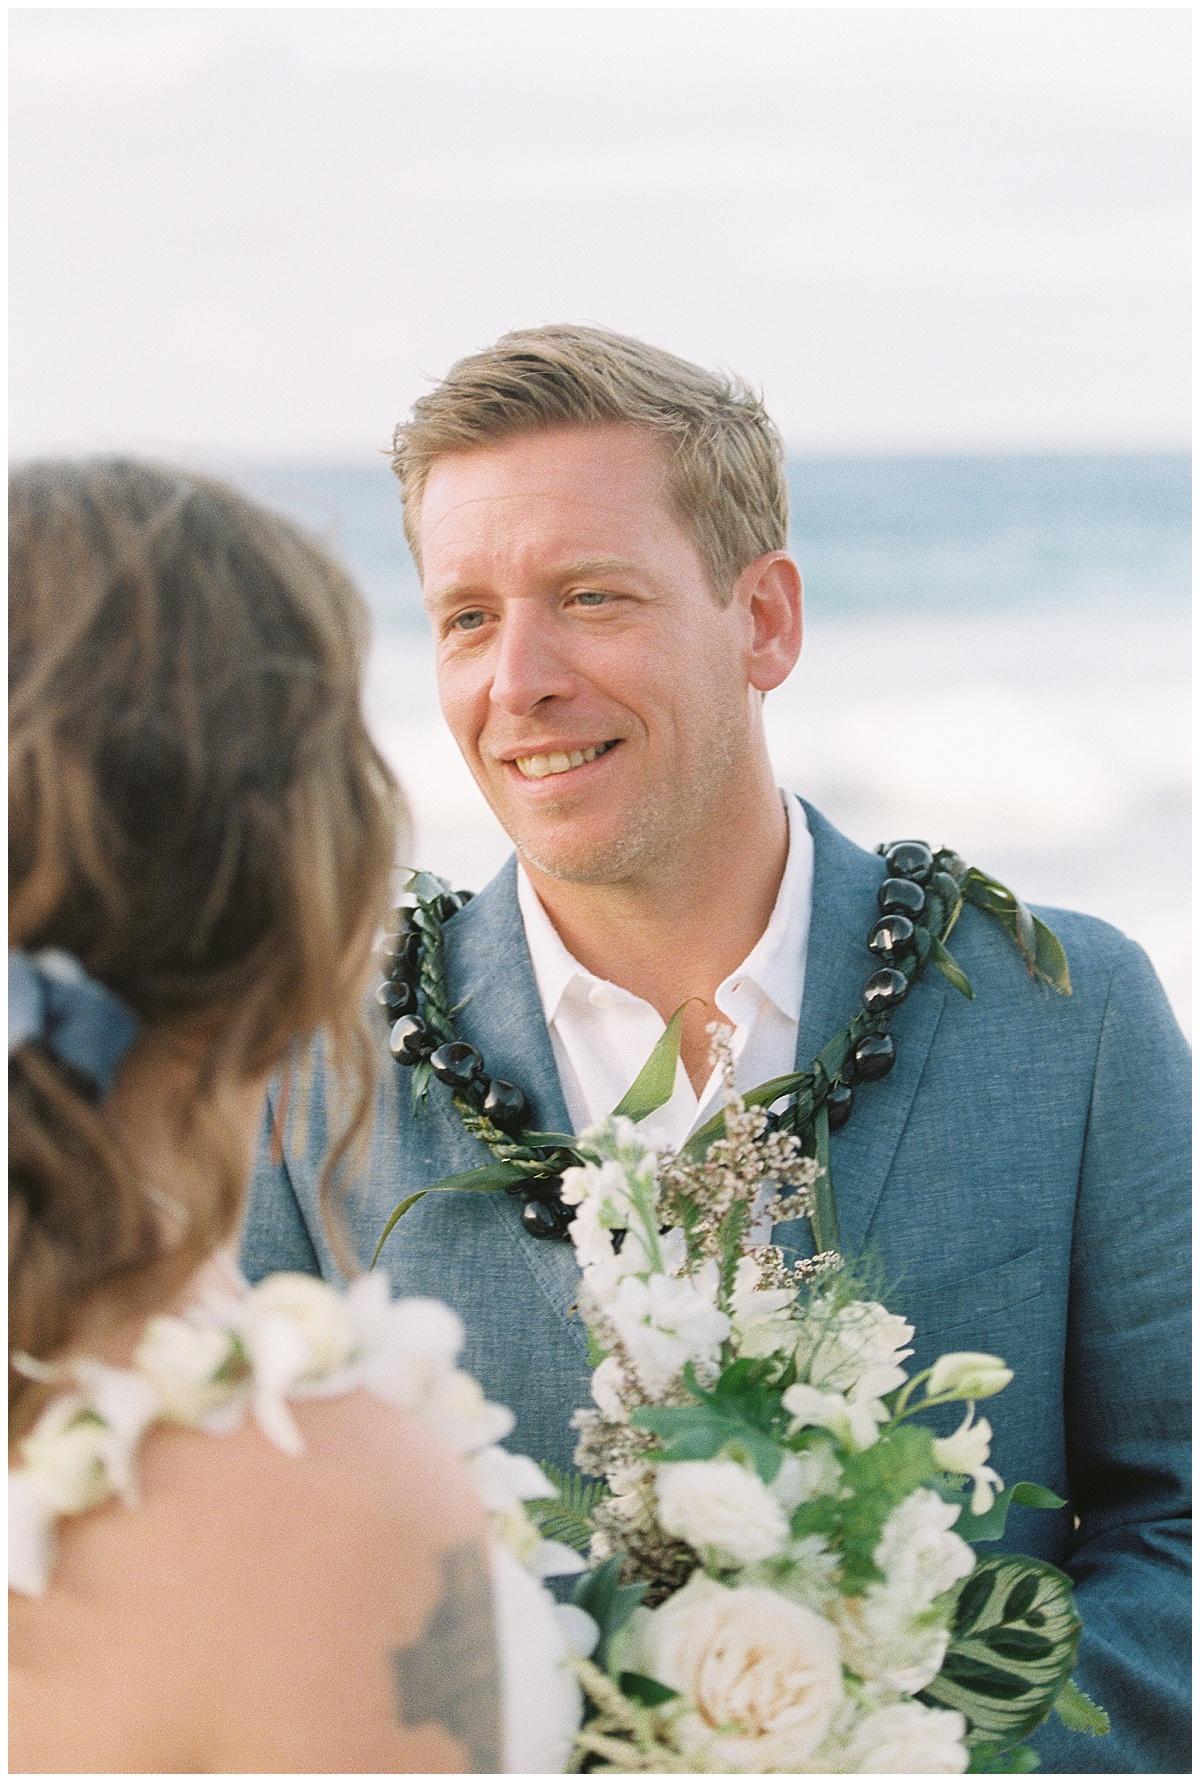 beach-elopement-maui-ironnwoods-beach-ceremony-groom-looking-at-bride.jpg